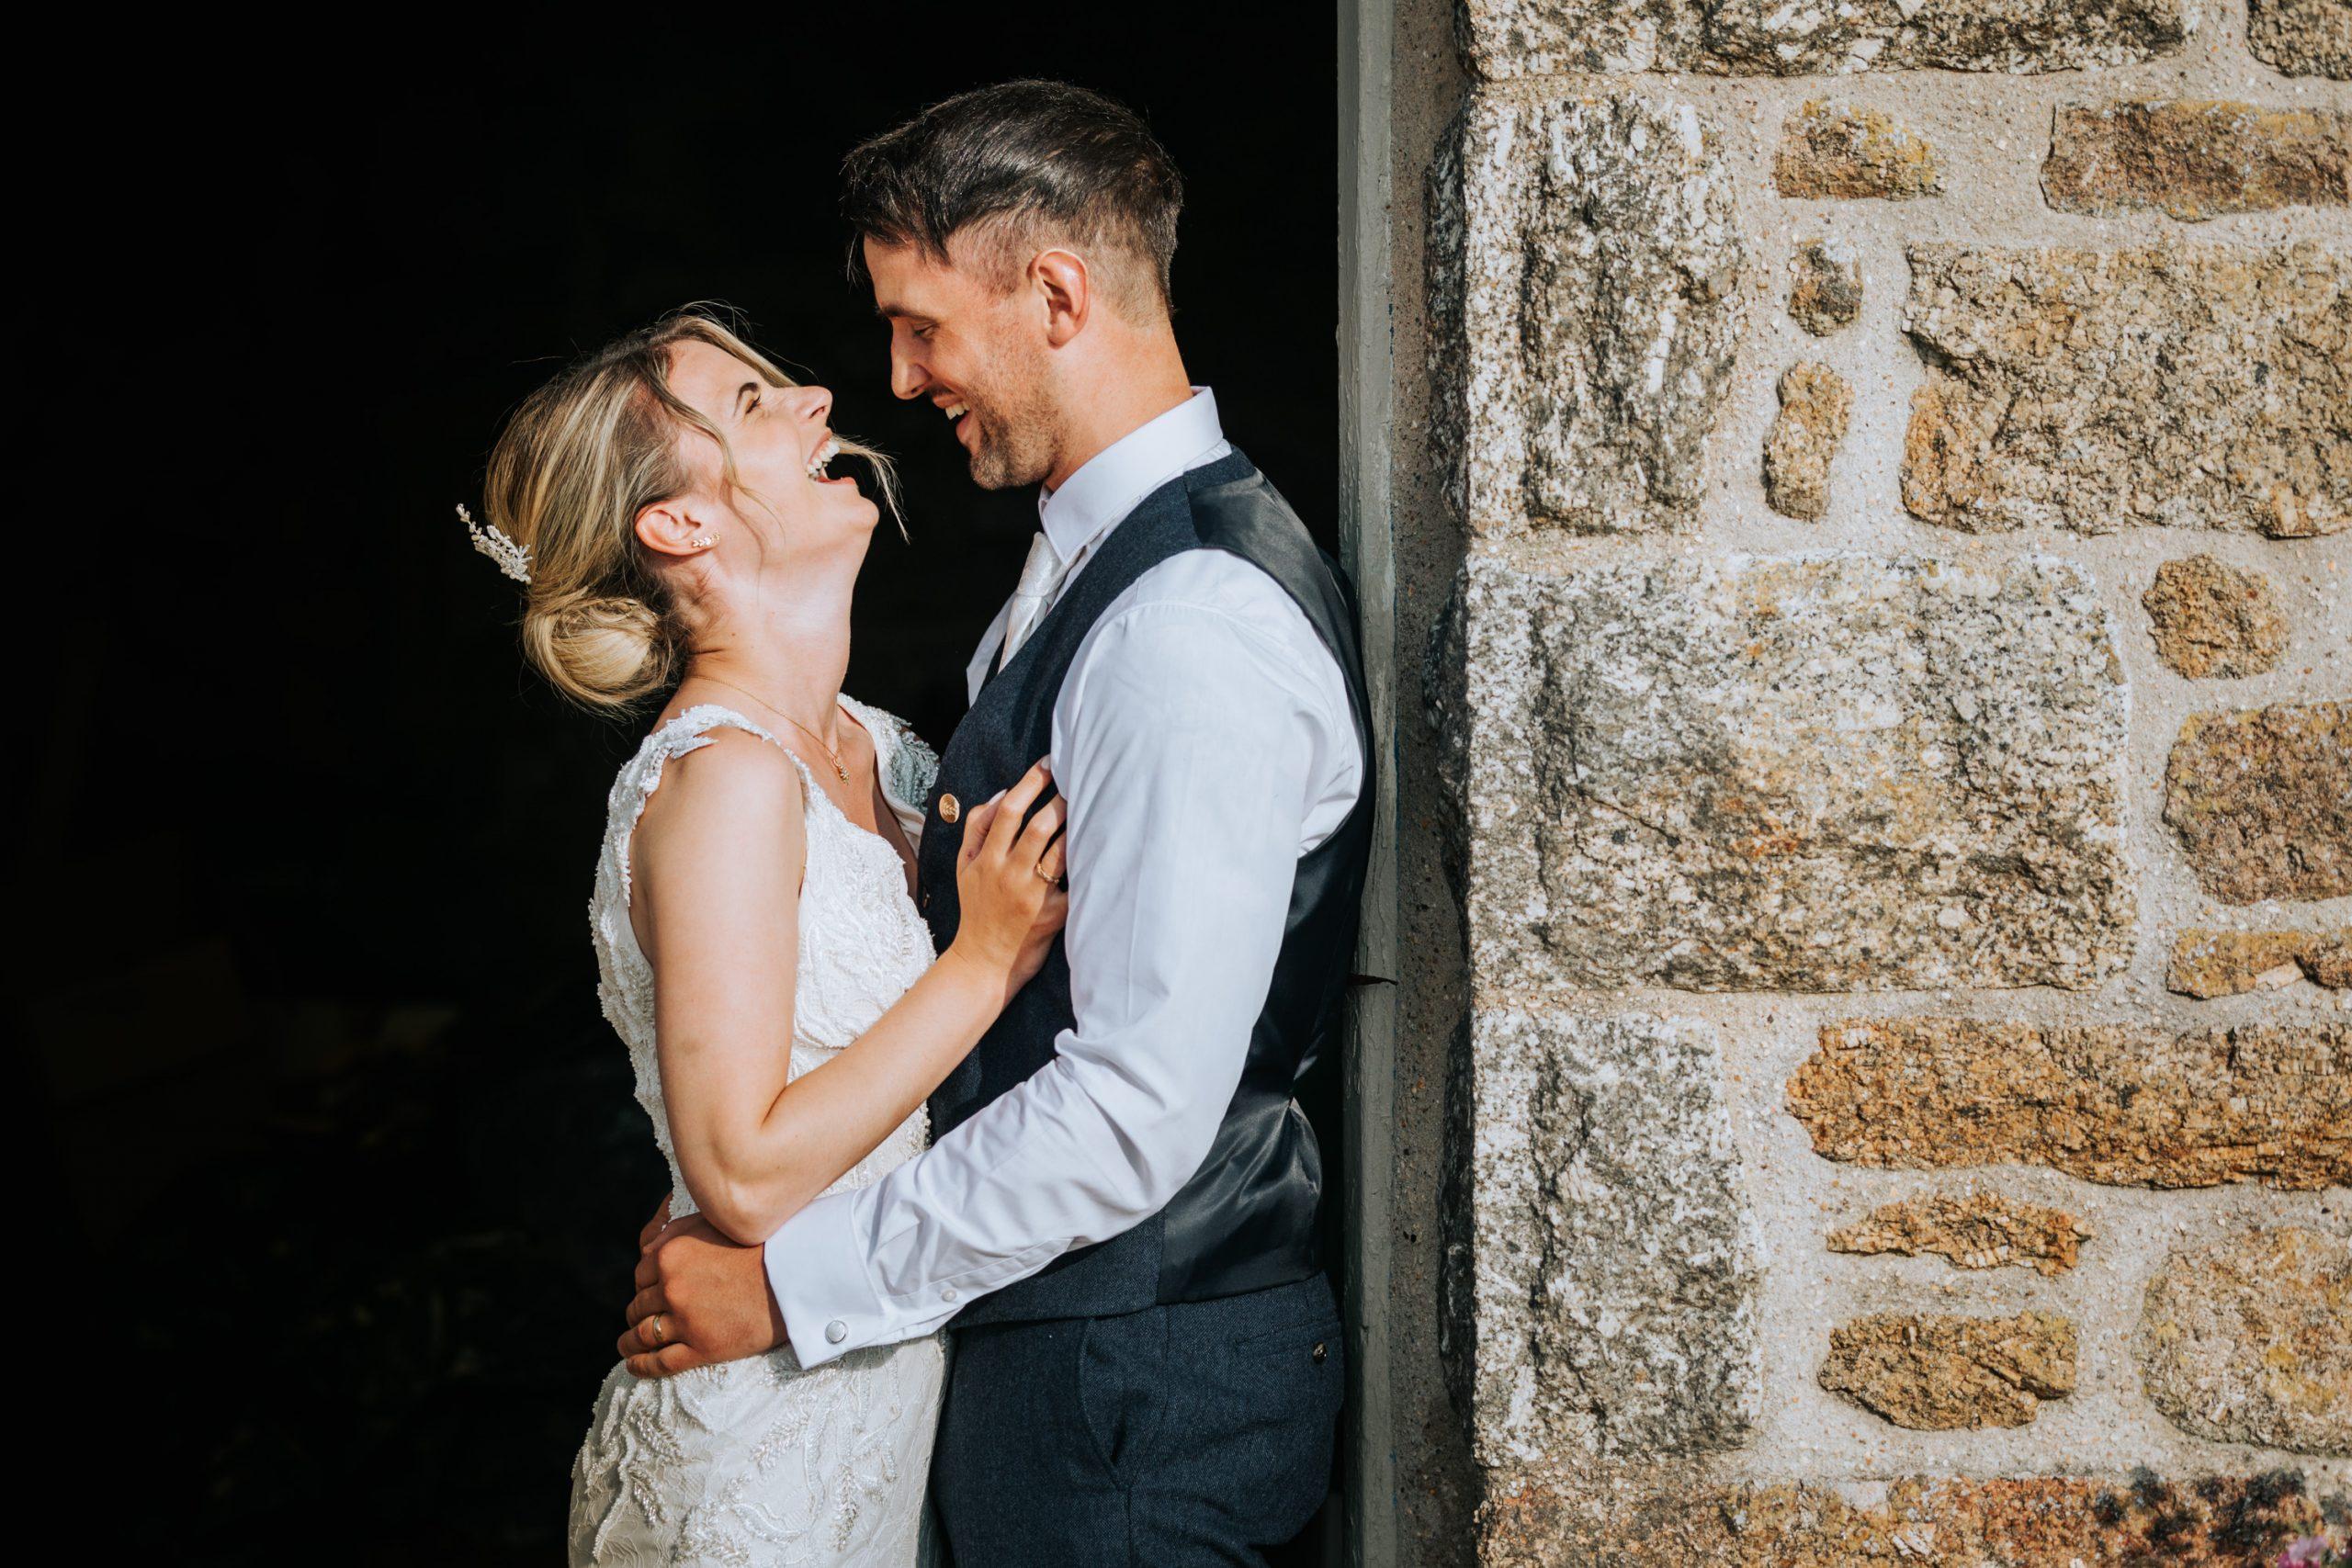 Chyprase Farm Wedding Photographer